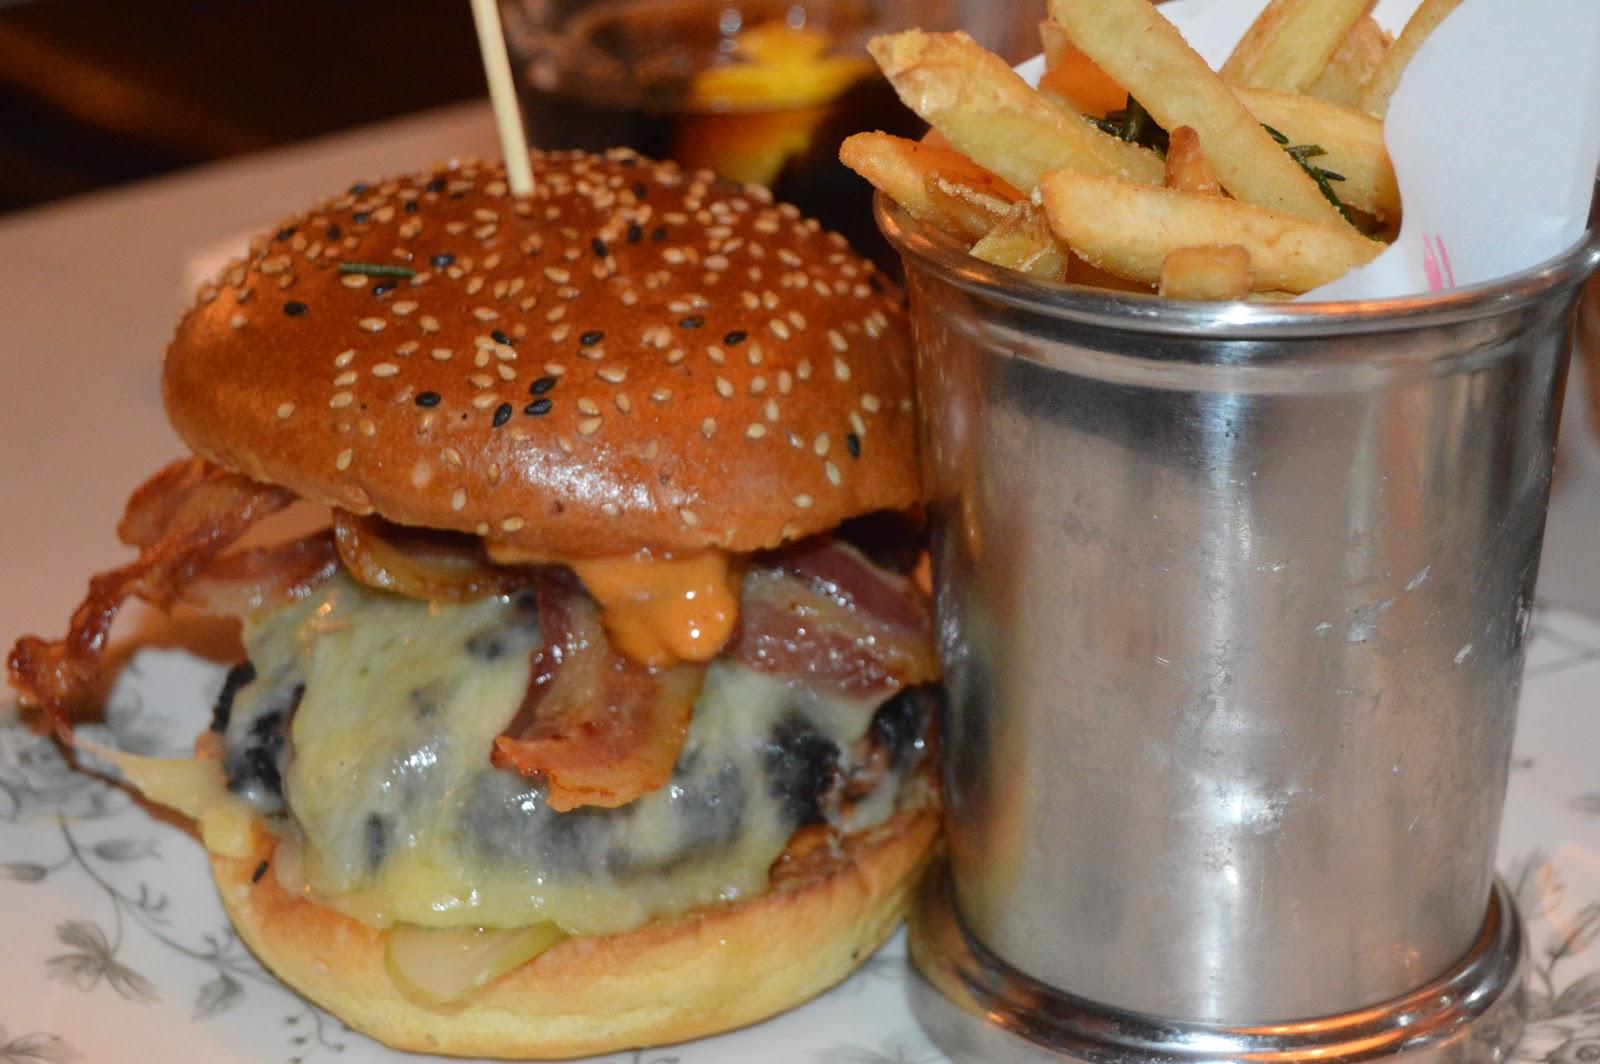 Bill's Classic Burger